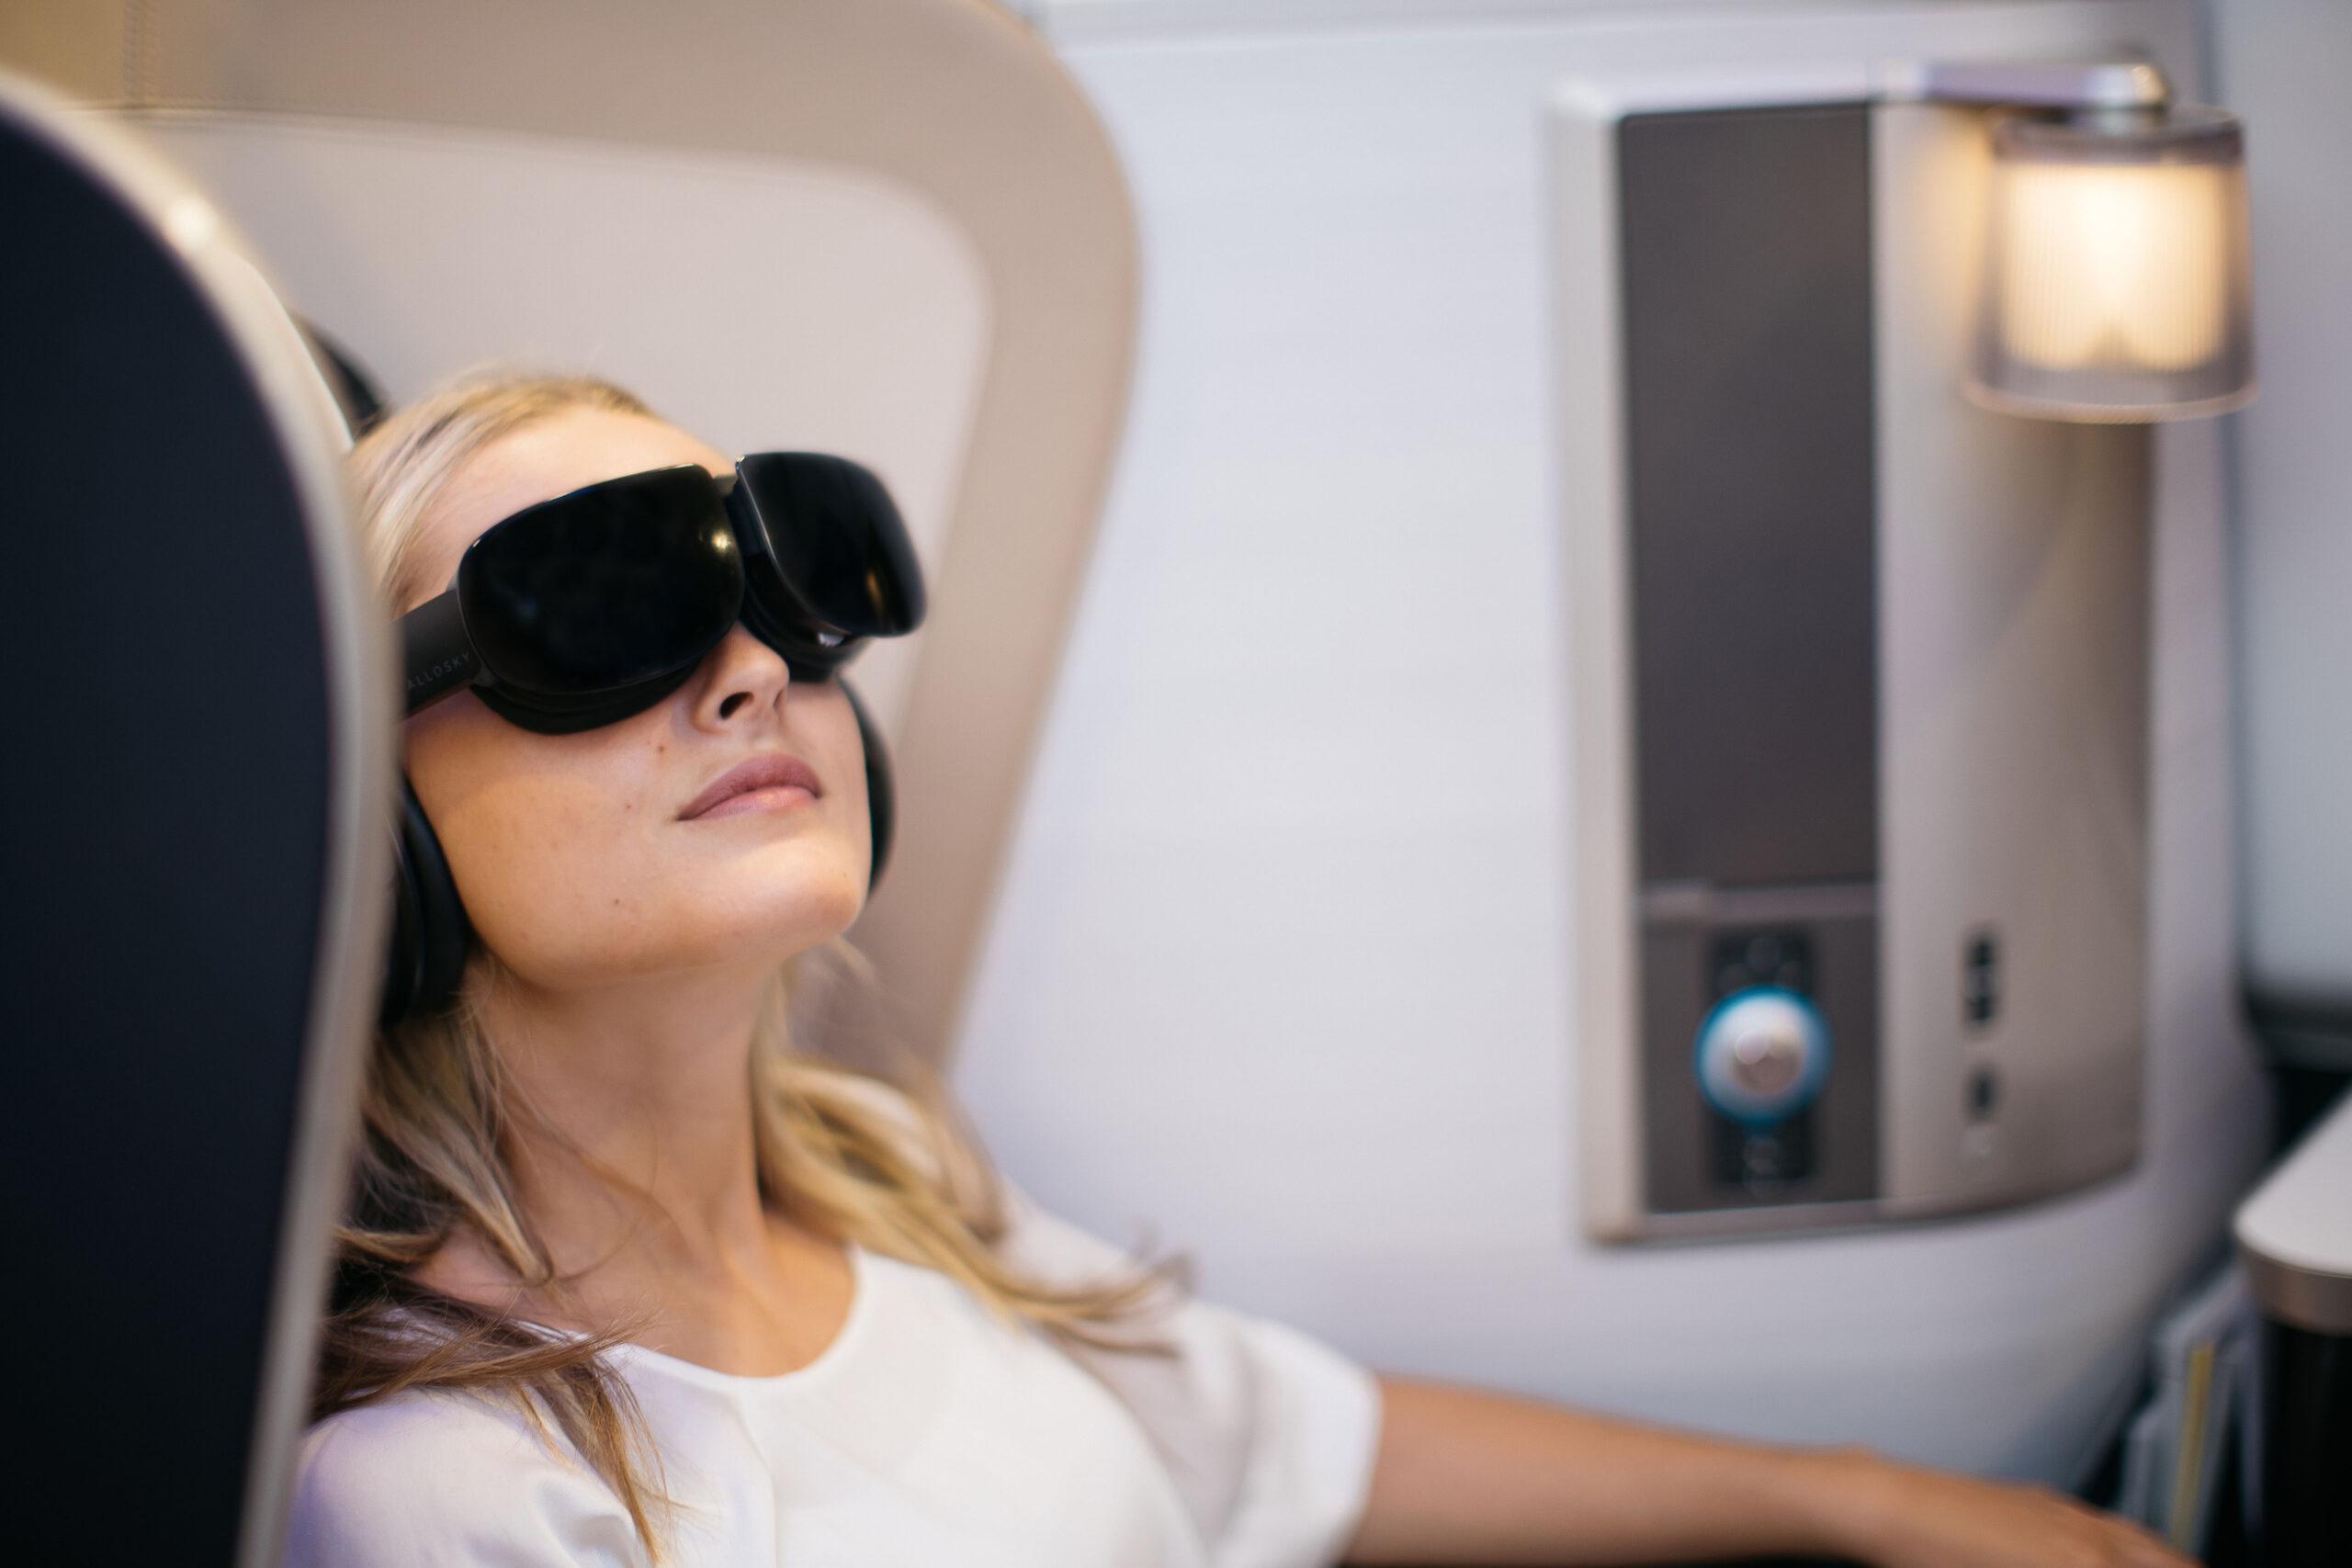 British Airways virtual reality headset